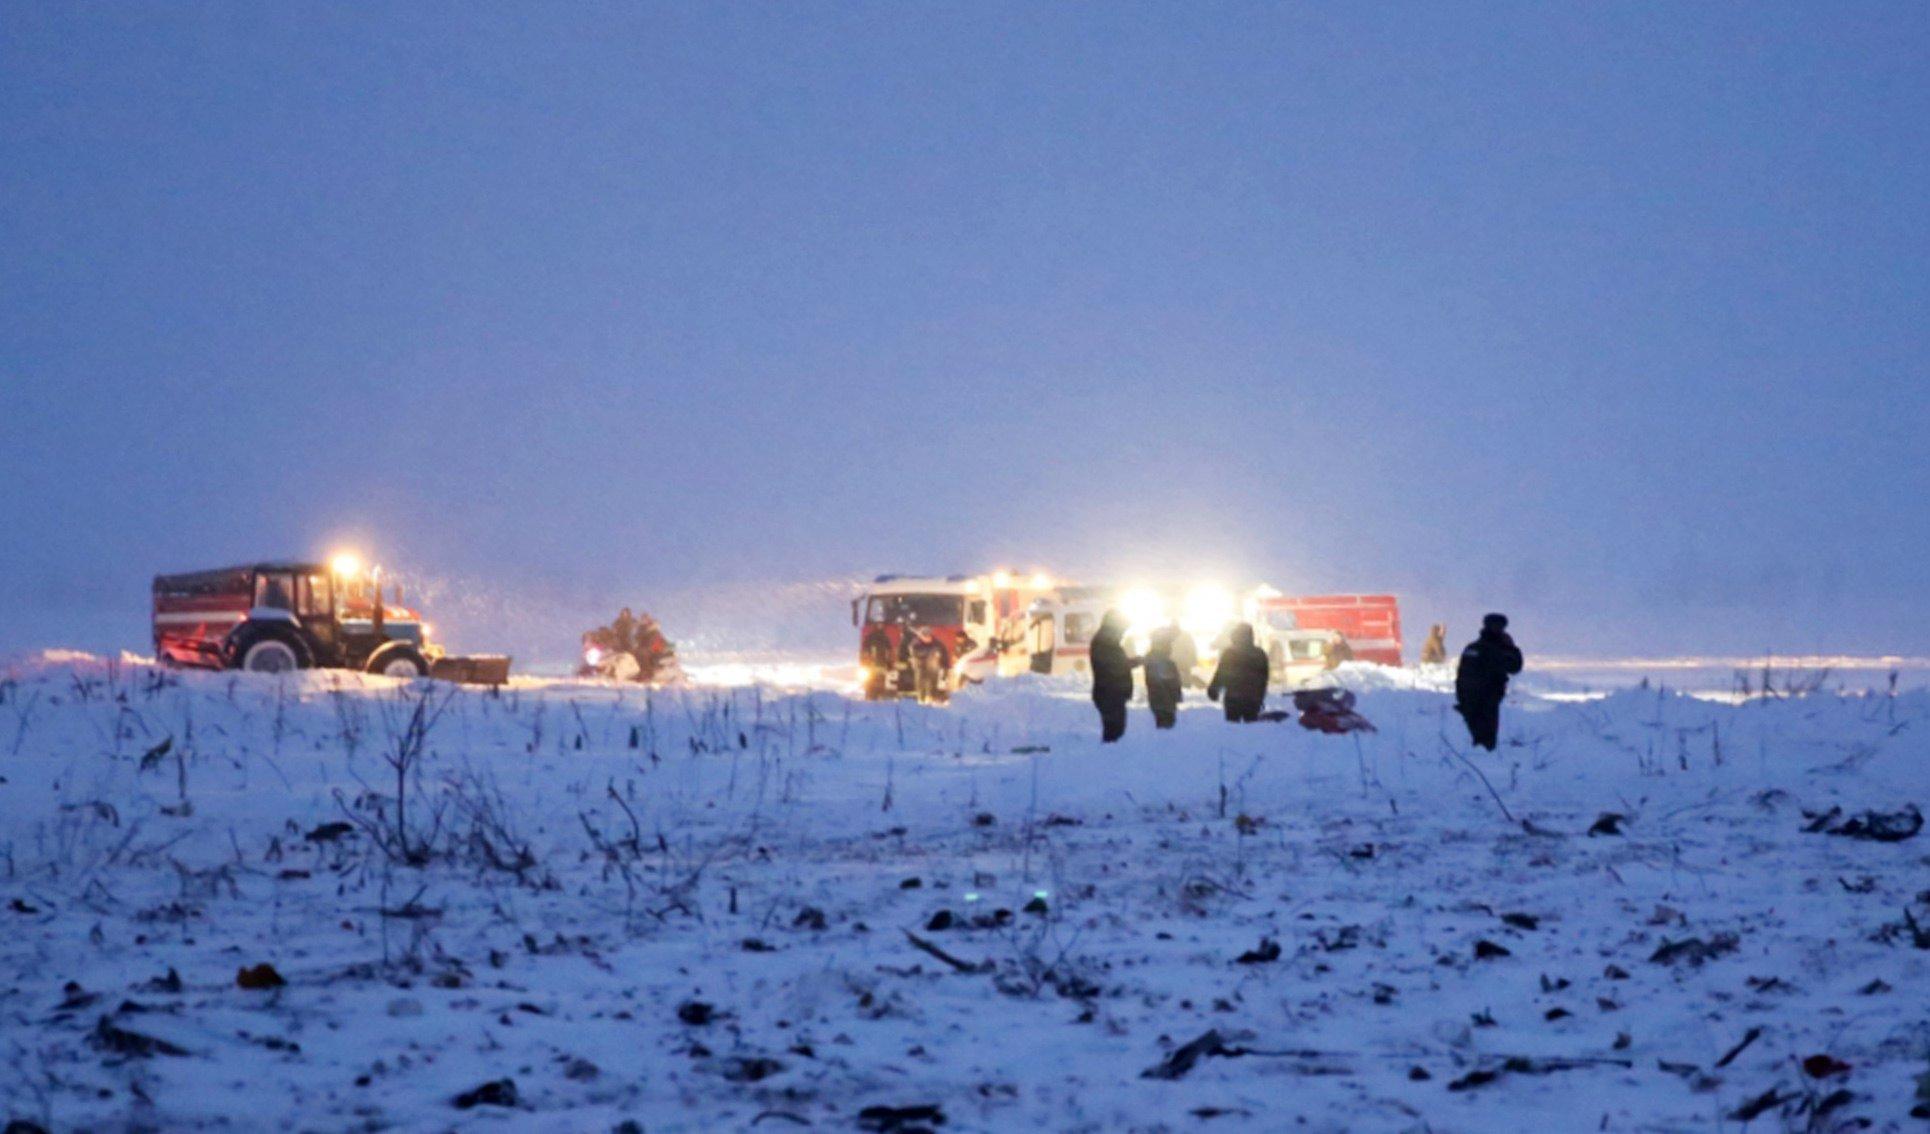 Mueren los 71 pasajeros de avión que se estrelló en Rusia, confirman autoridades